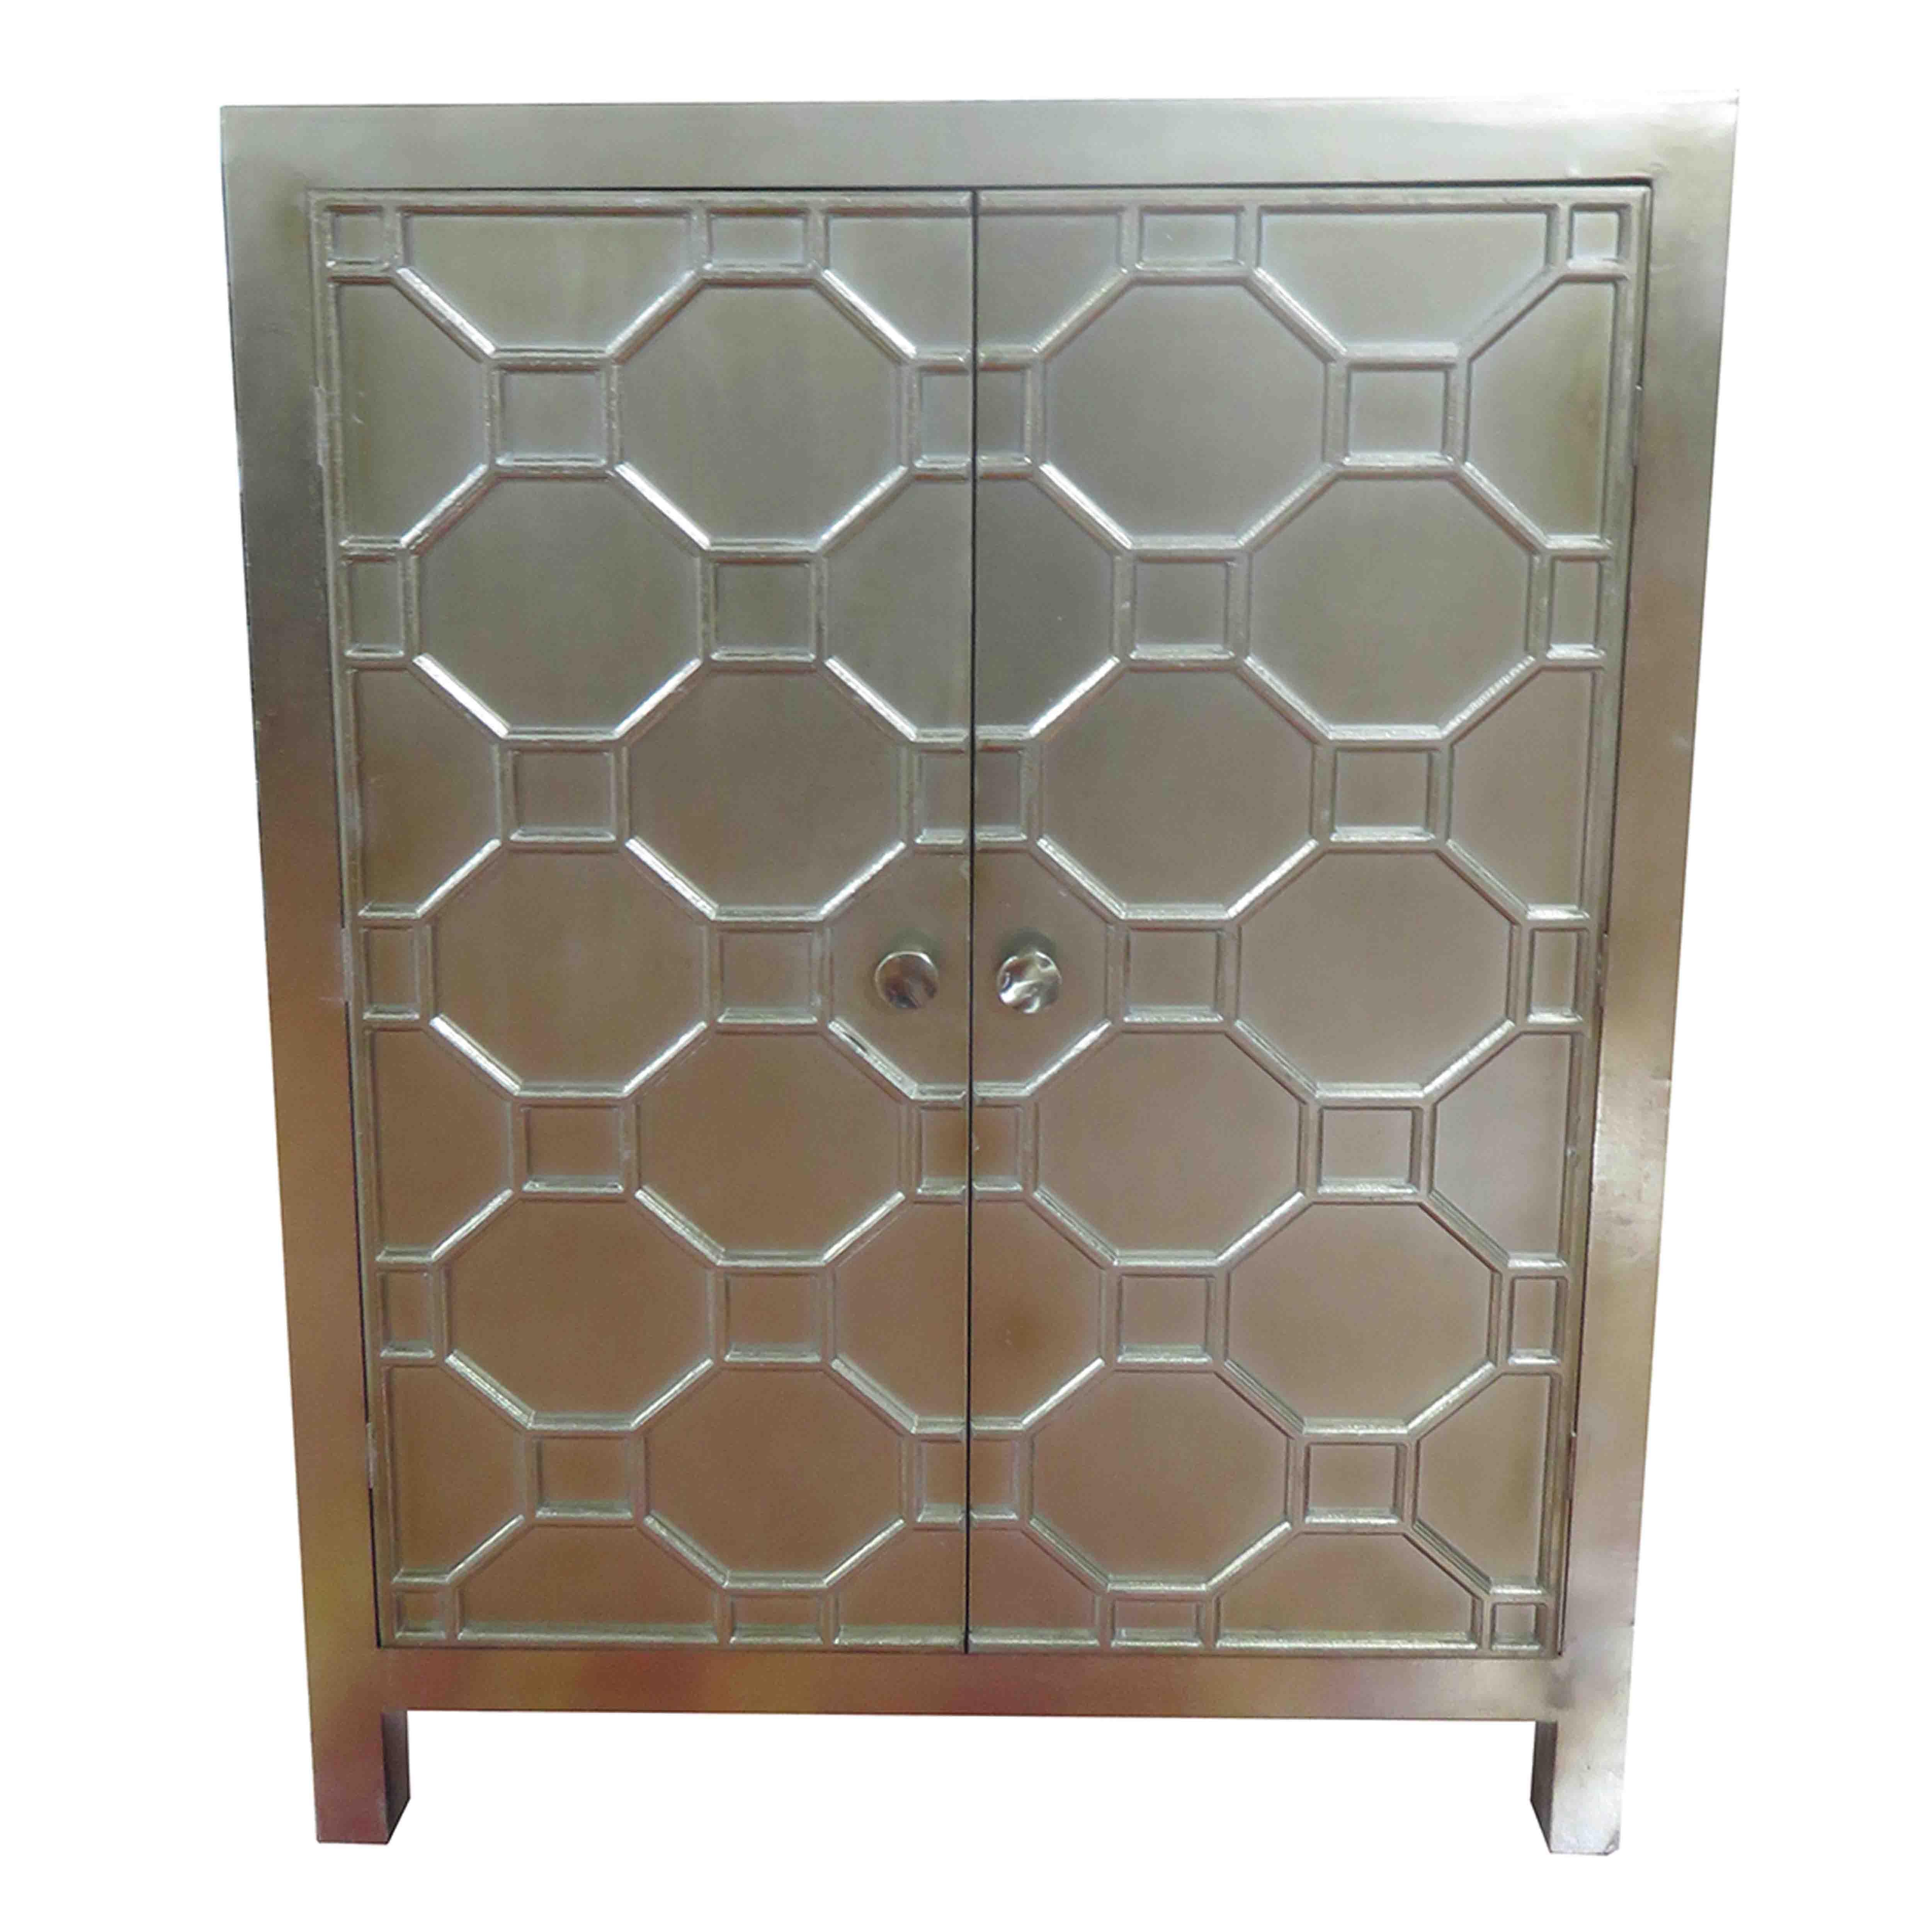 Superb Silvestro Distressed Bar Cabinet, Antique Champagne/2100003 AC